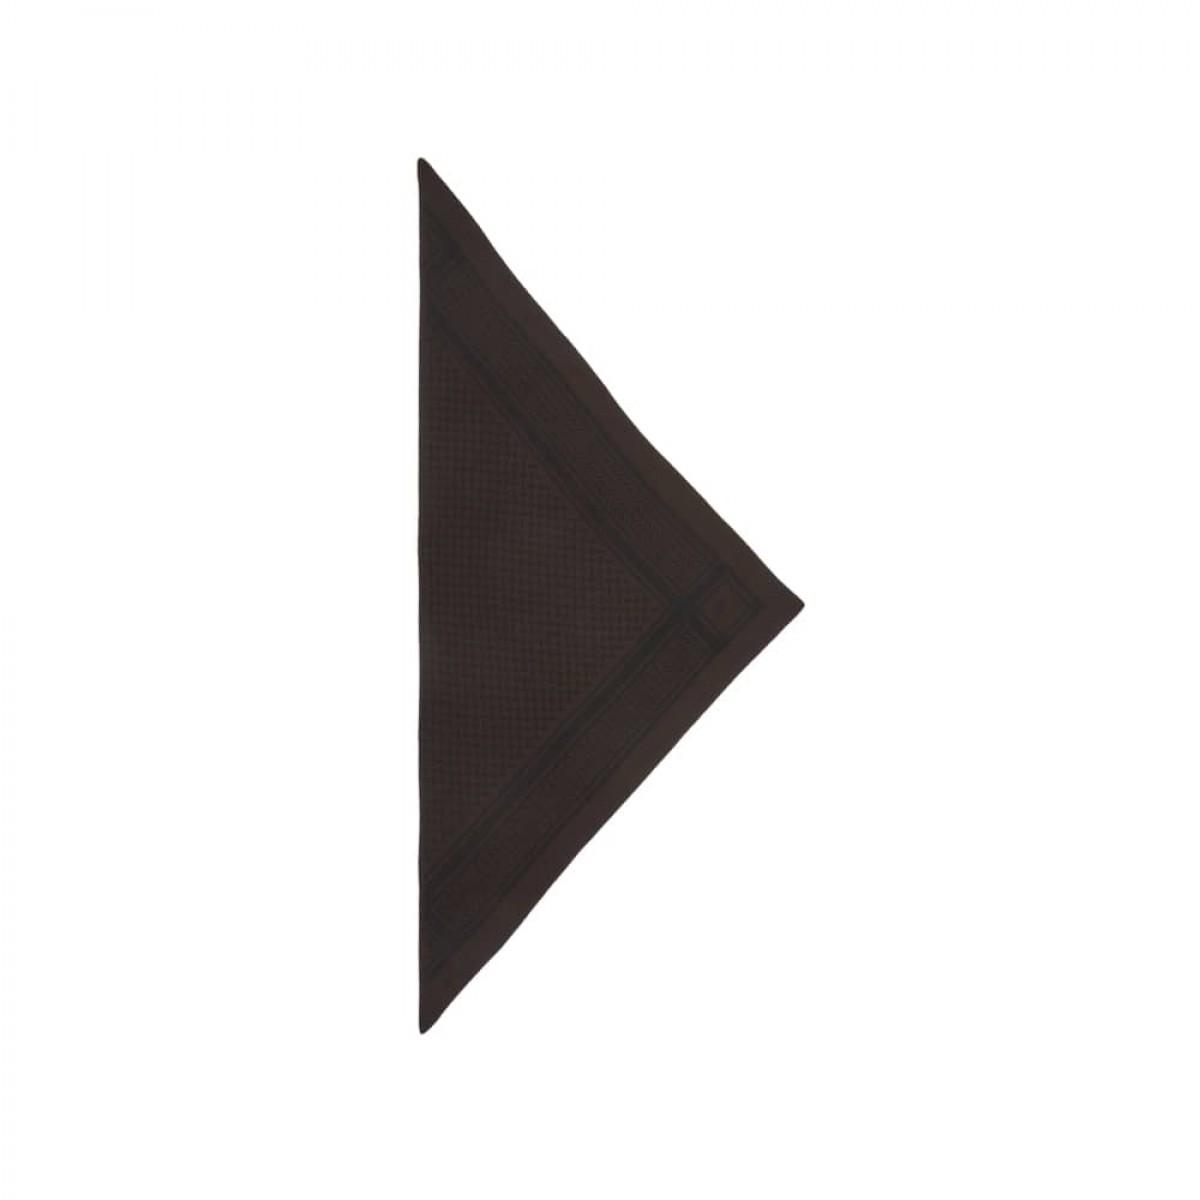 triangle trinity classic m - black on moka - front